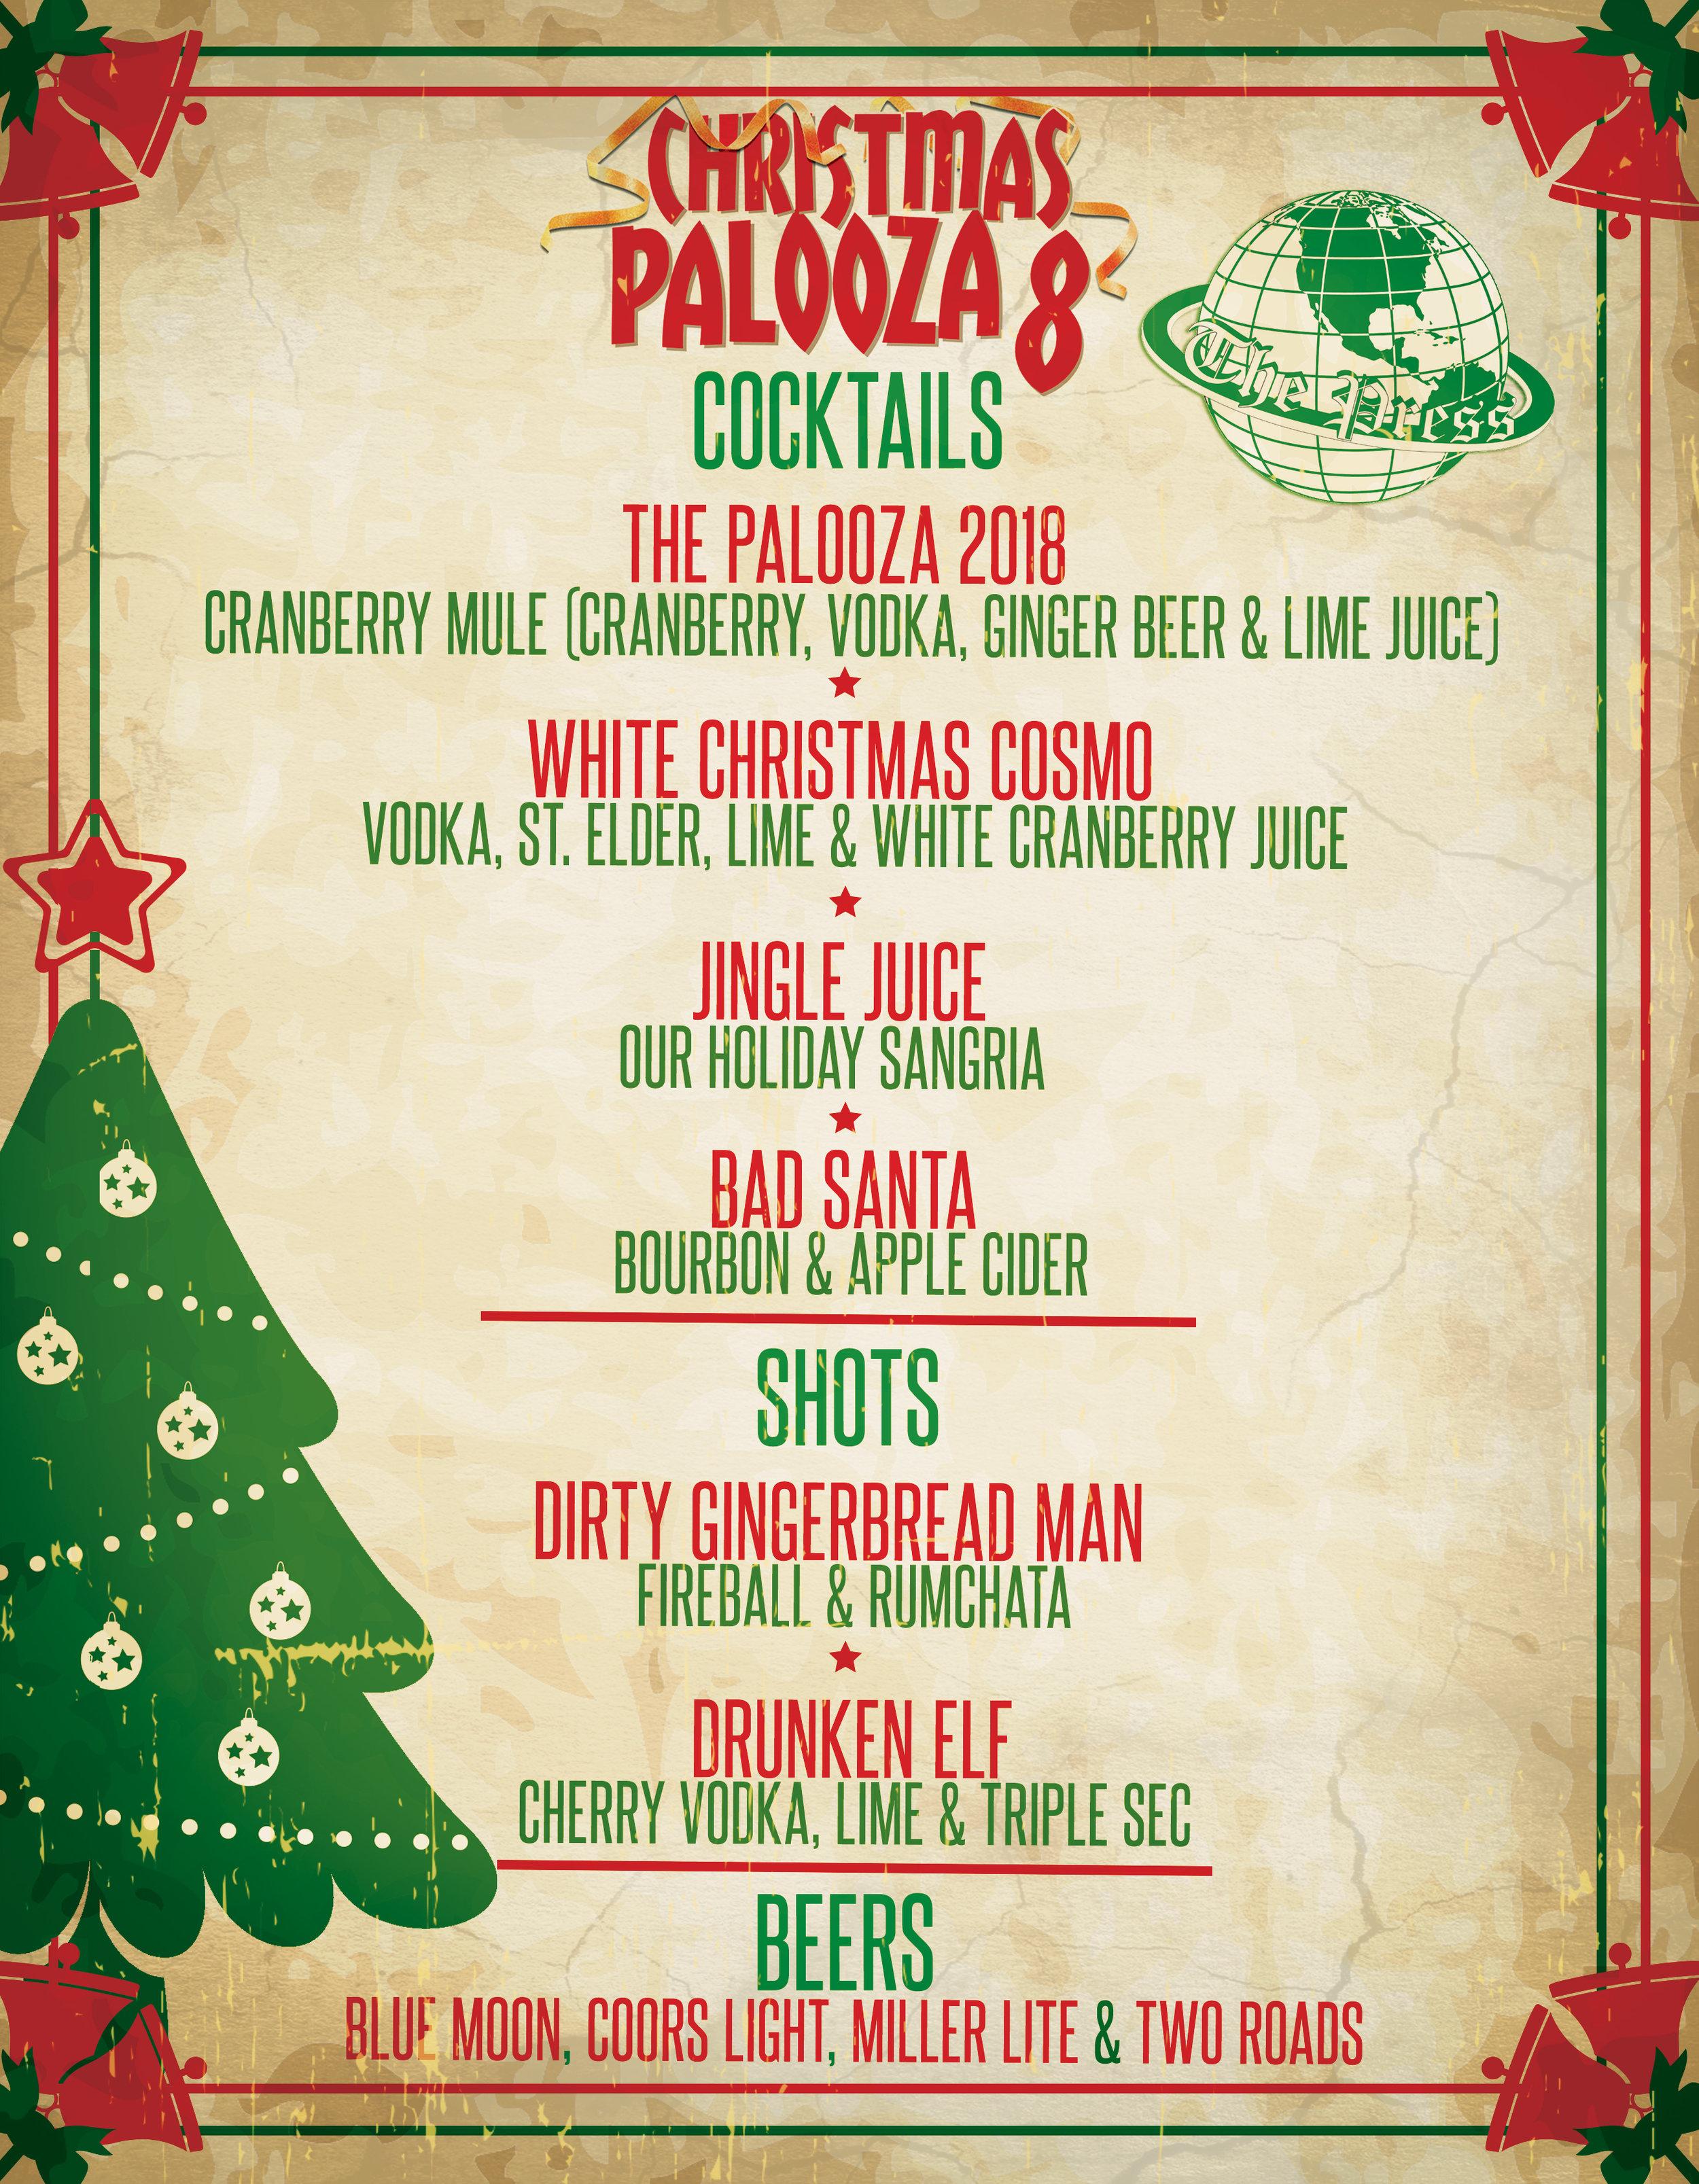 CHRISTMASPALOOZA8-THEPRESSHARTFORD-cocktail-menu.jpg